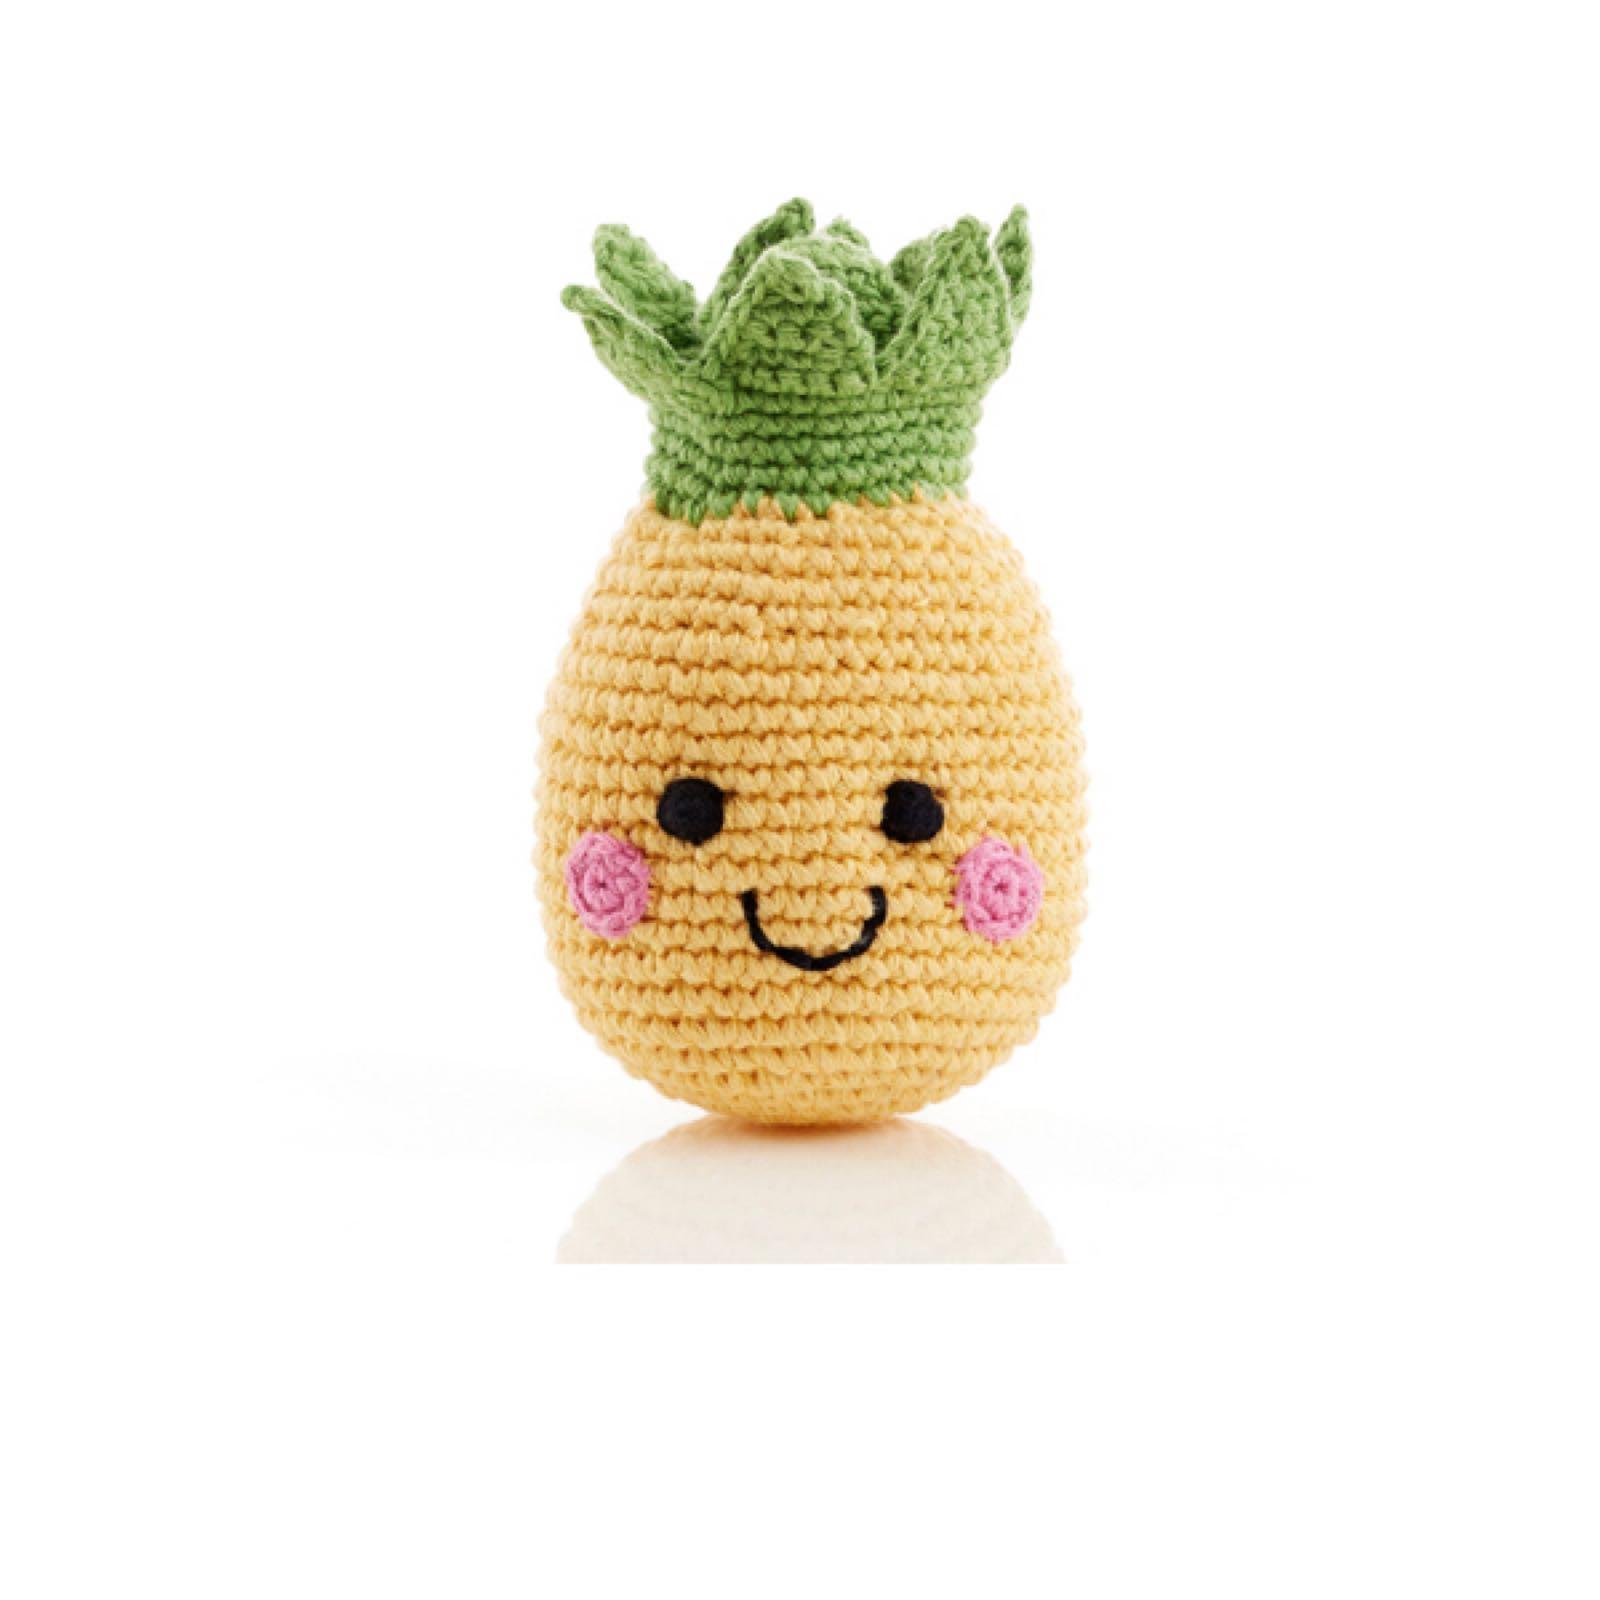 Pebble - Crochet cotton rattle - Pineapple